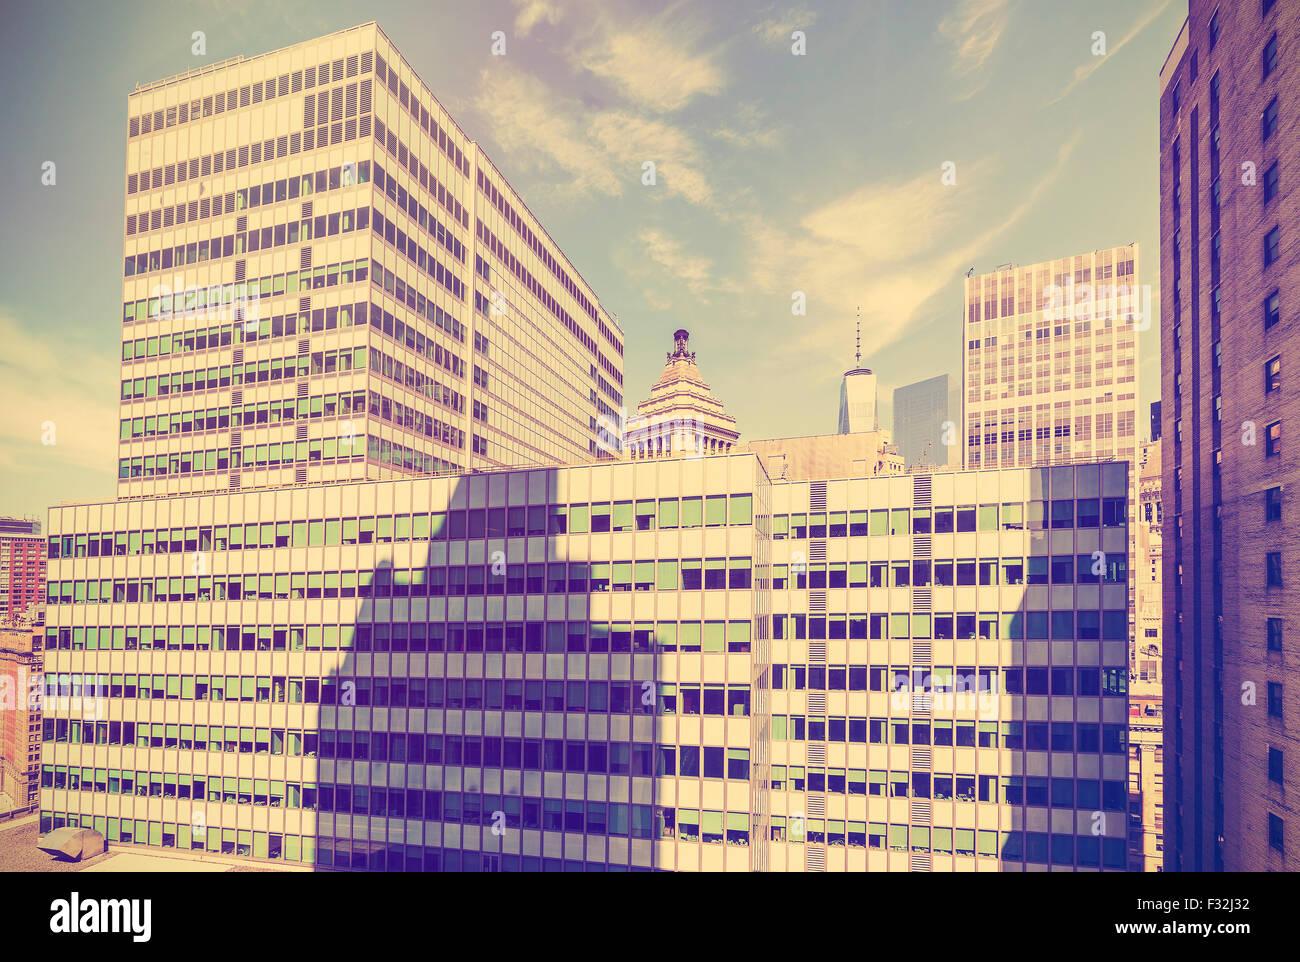 Vintage stylized view of Manhattan, New York City, USA. - Stock Image